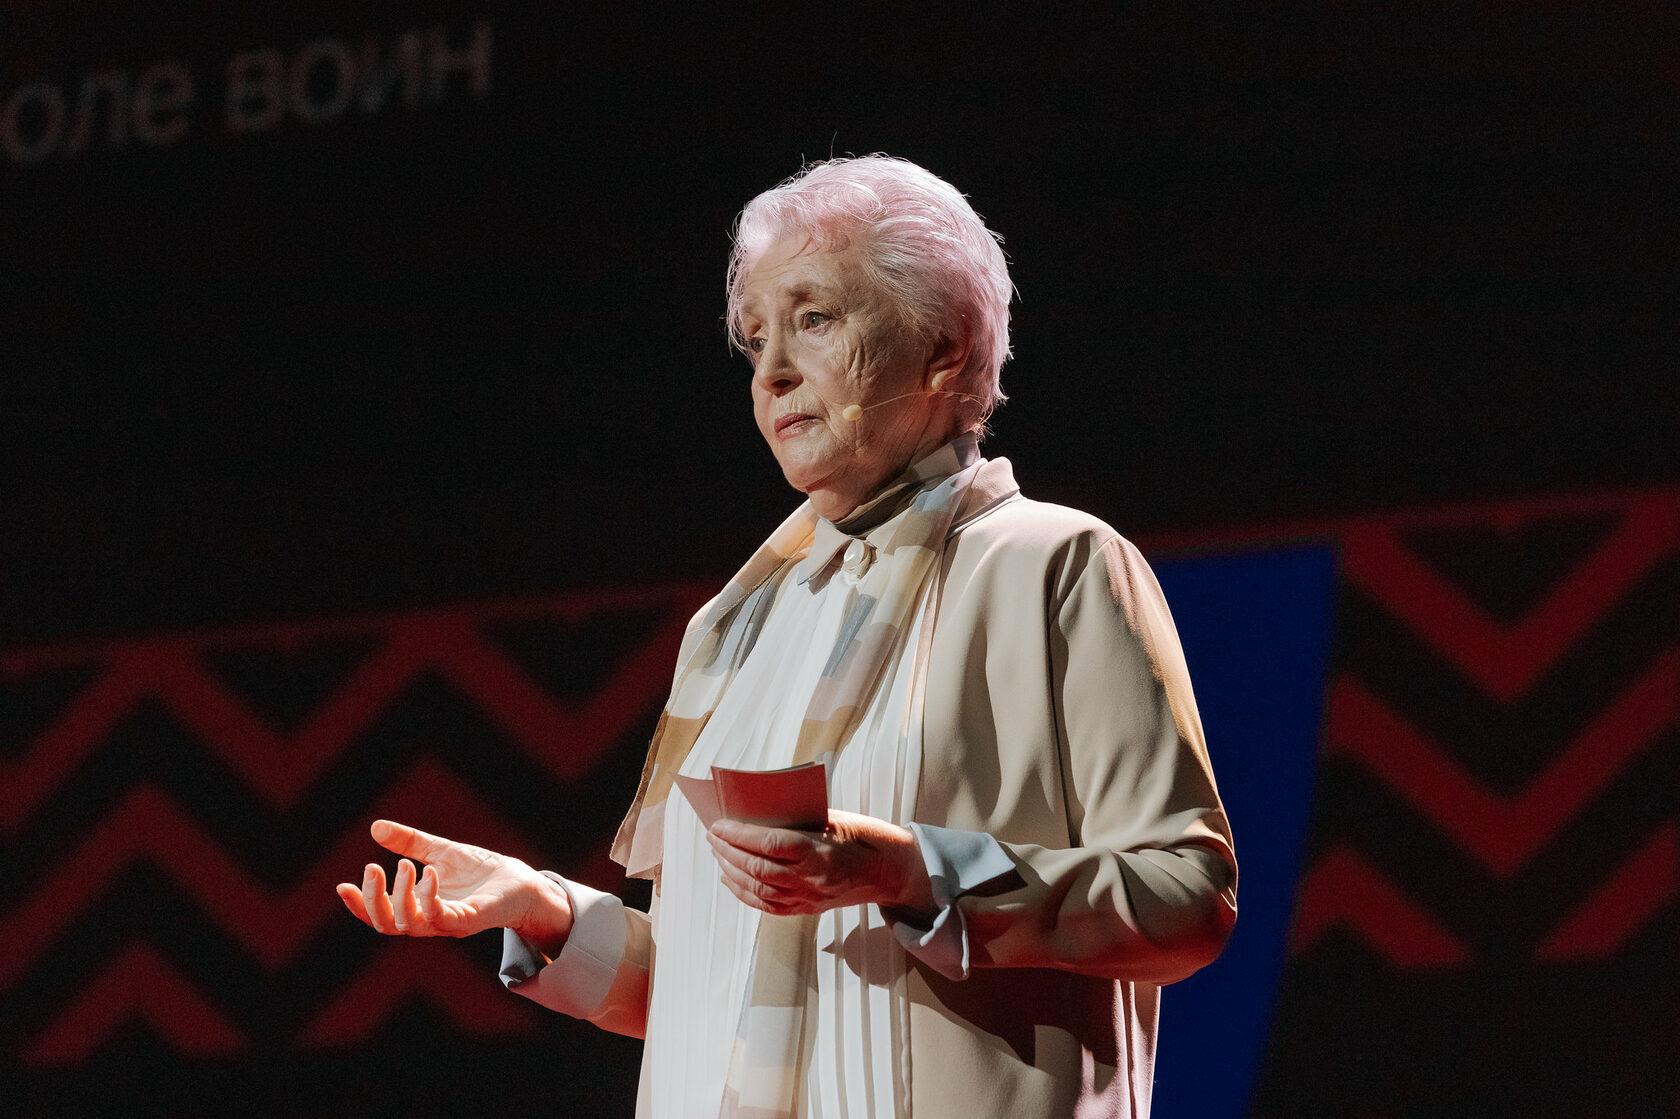 (c) TedxSadovoeRing